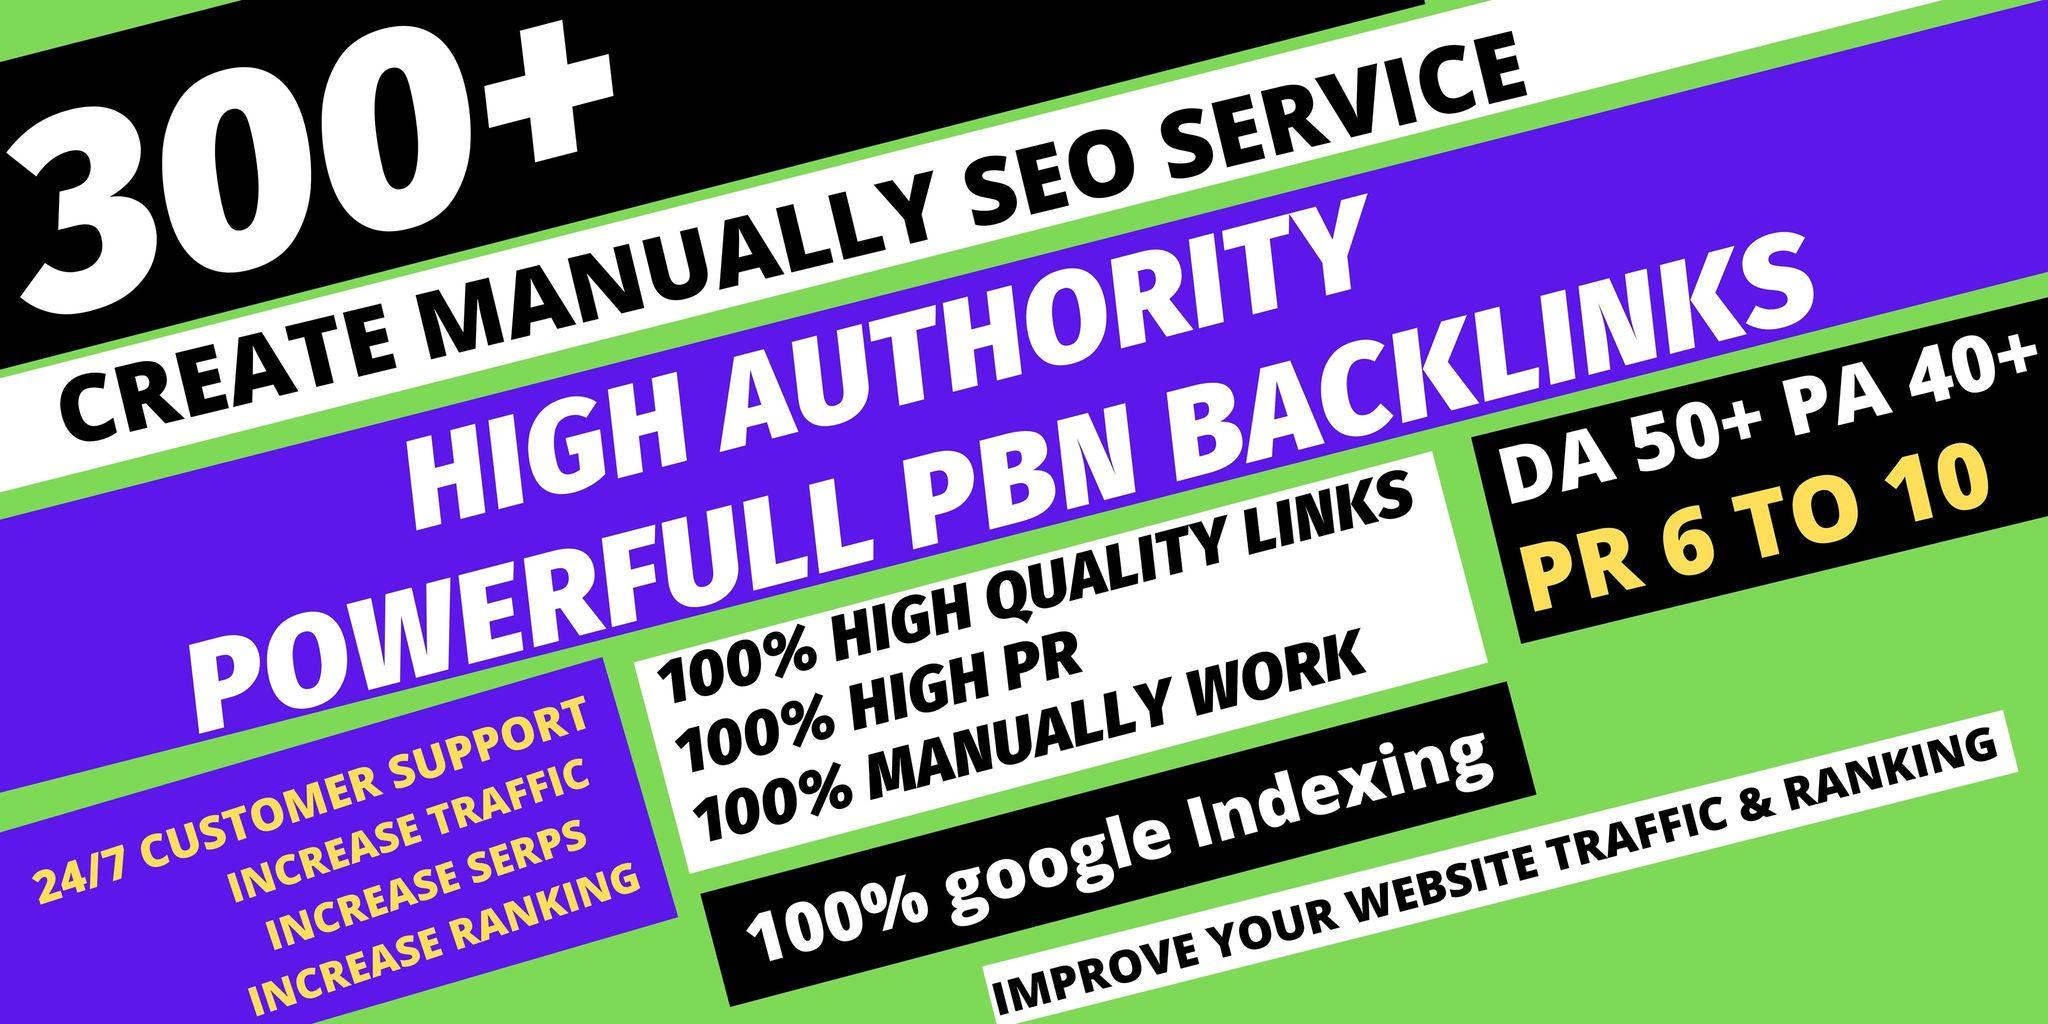 get permanent 300 Pbn Backlink DA50+PA40+PR6+homepage web 2.0 with dofollow unique site